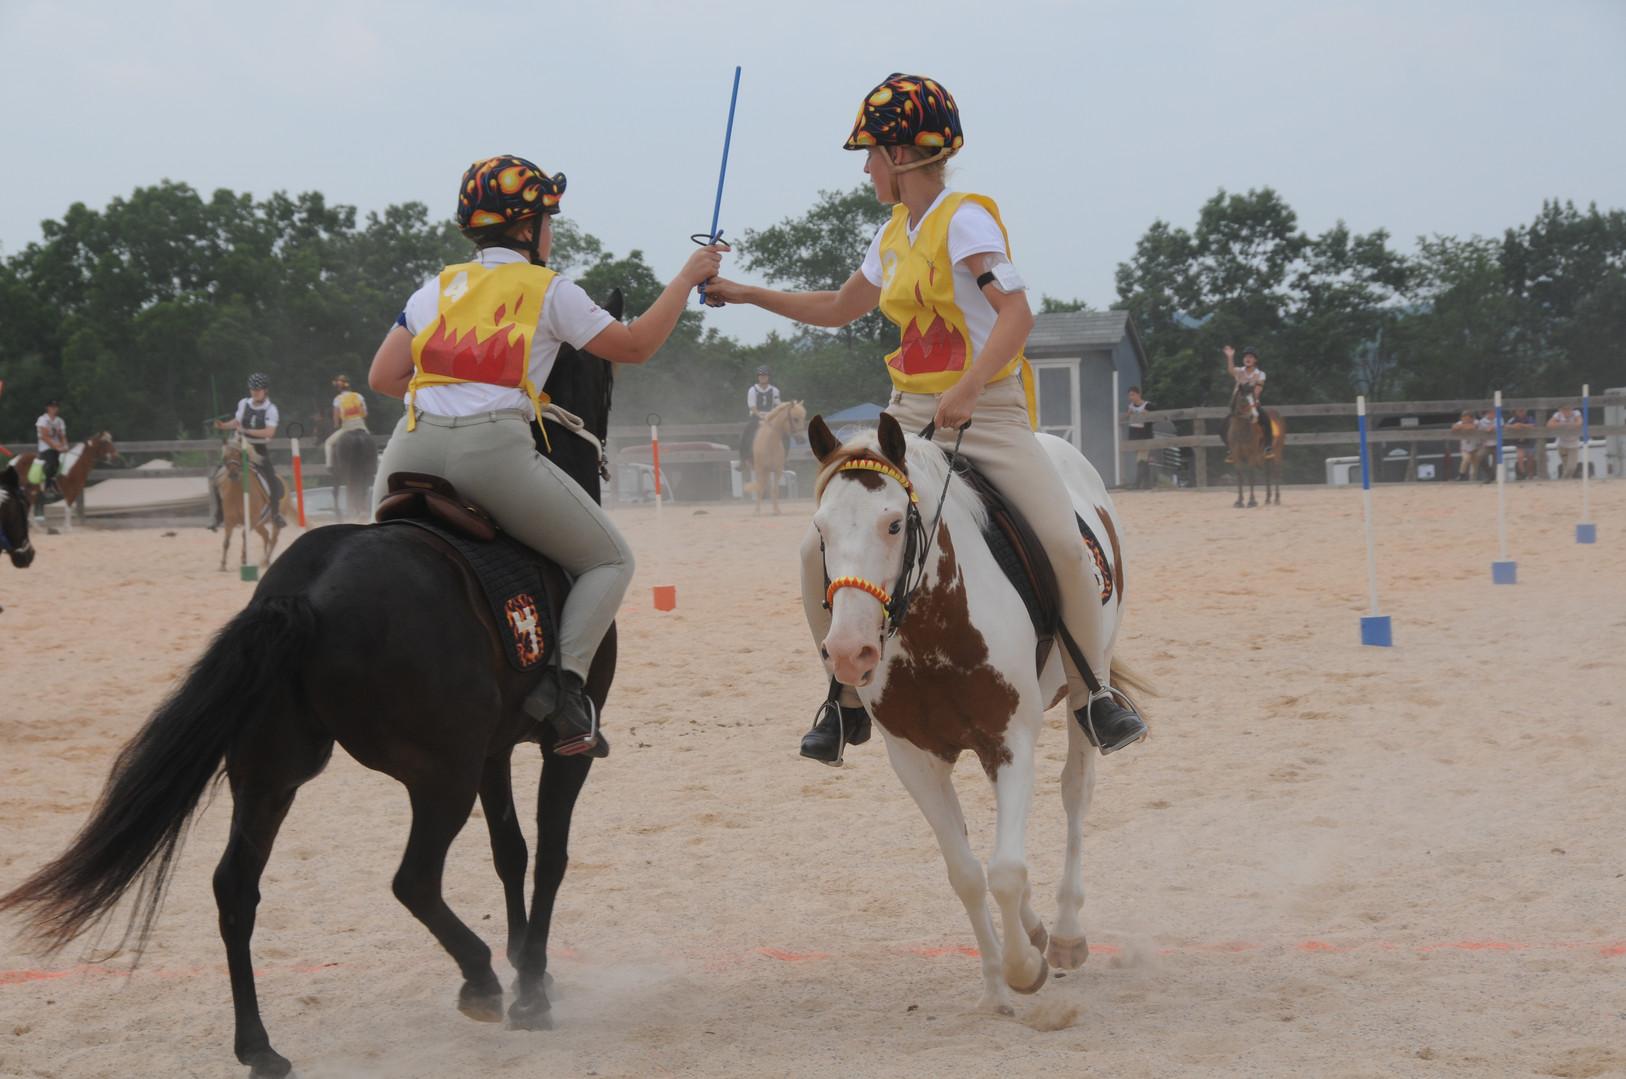 Leroy and Bo at Pony Club Games Rally